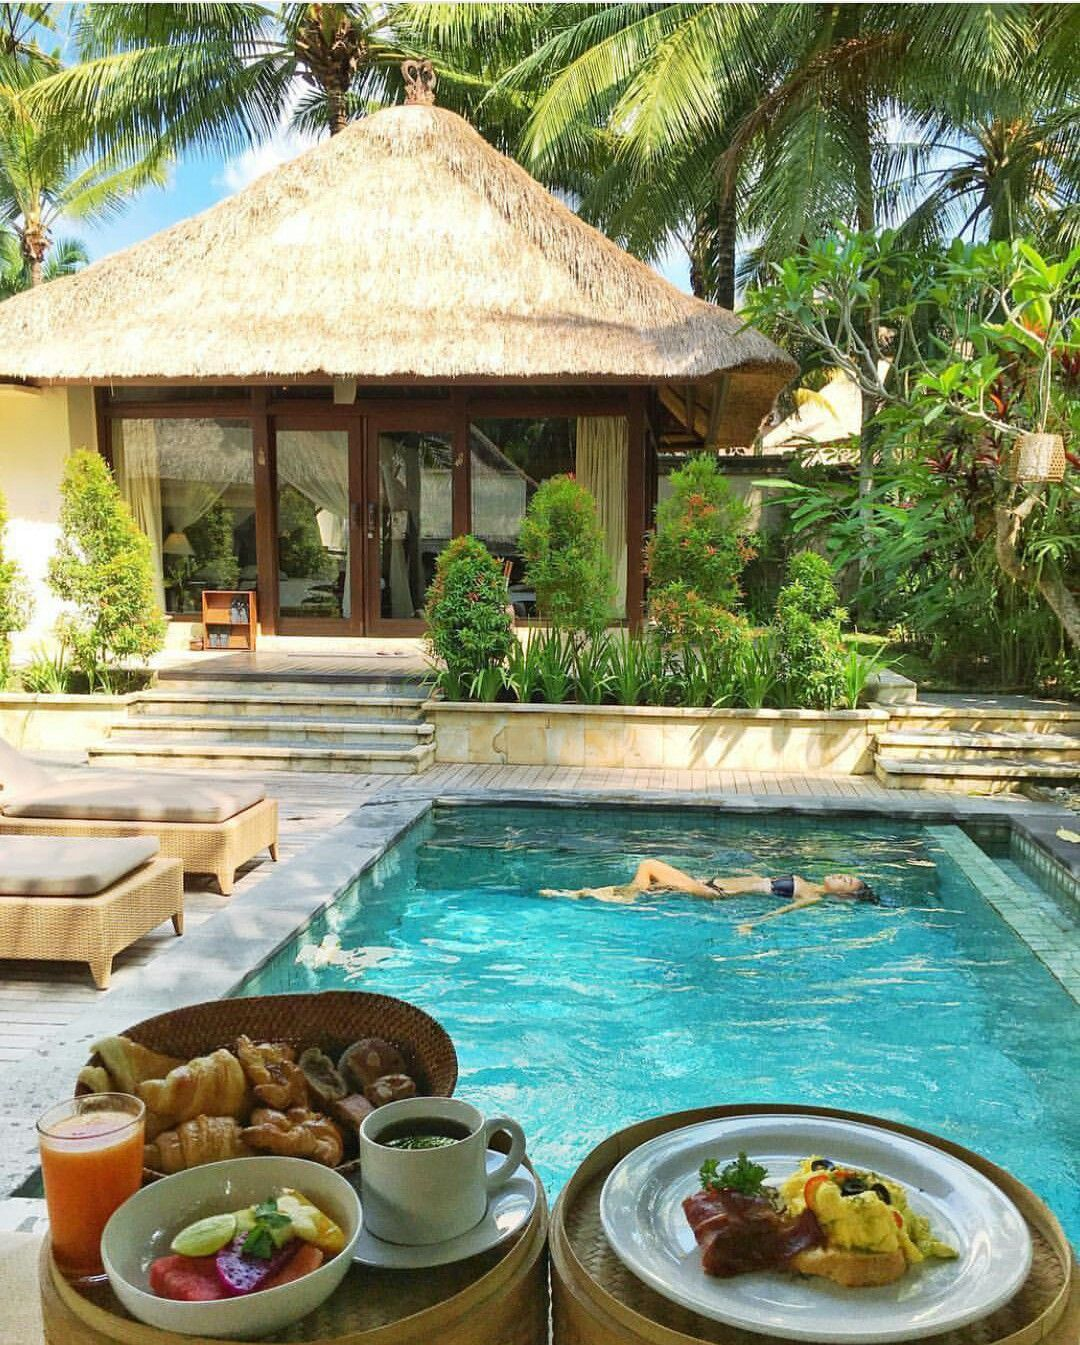 ubud village resort and spa bali traveling u003c3 pinterest